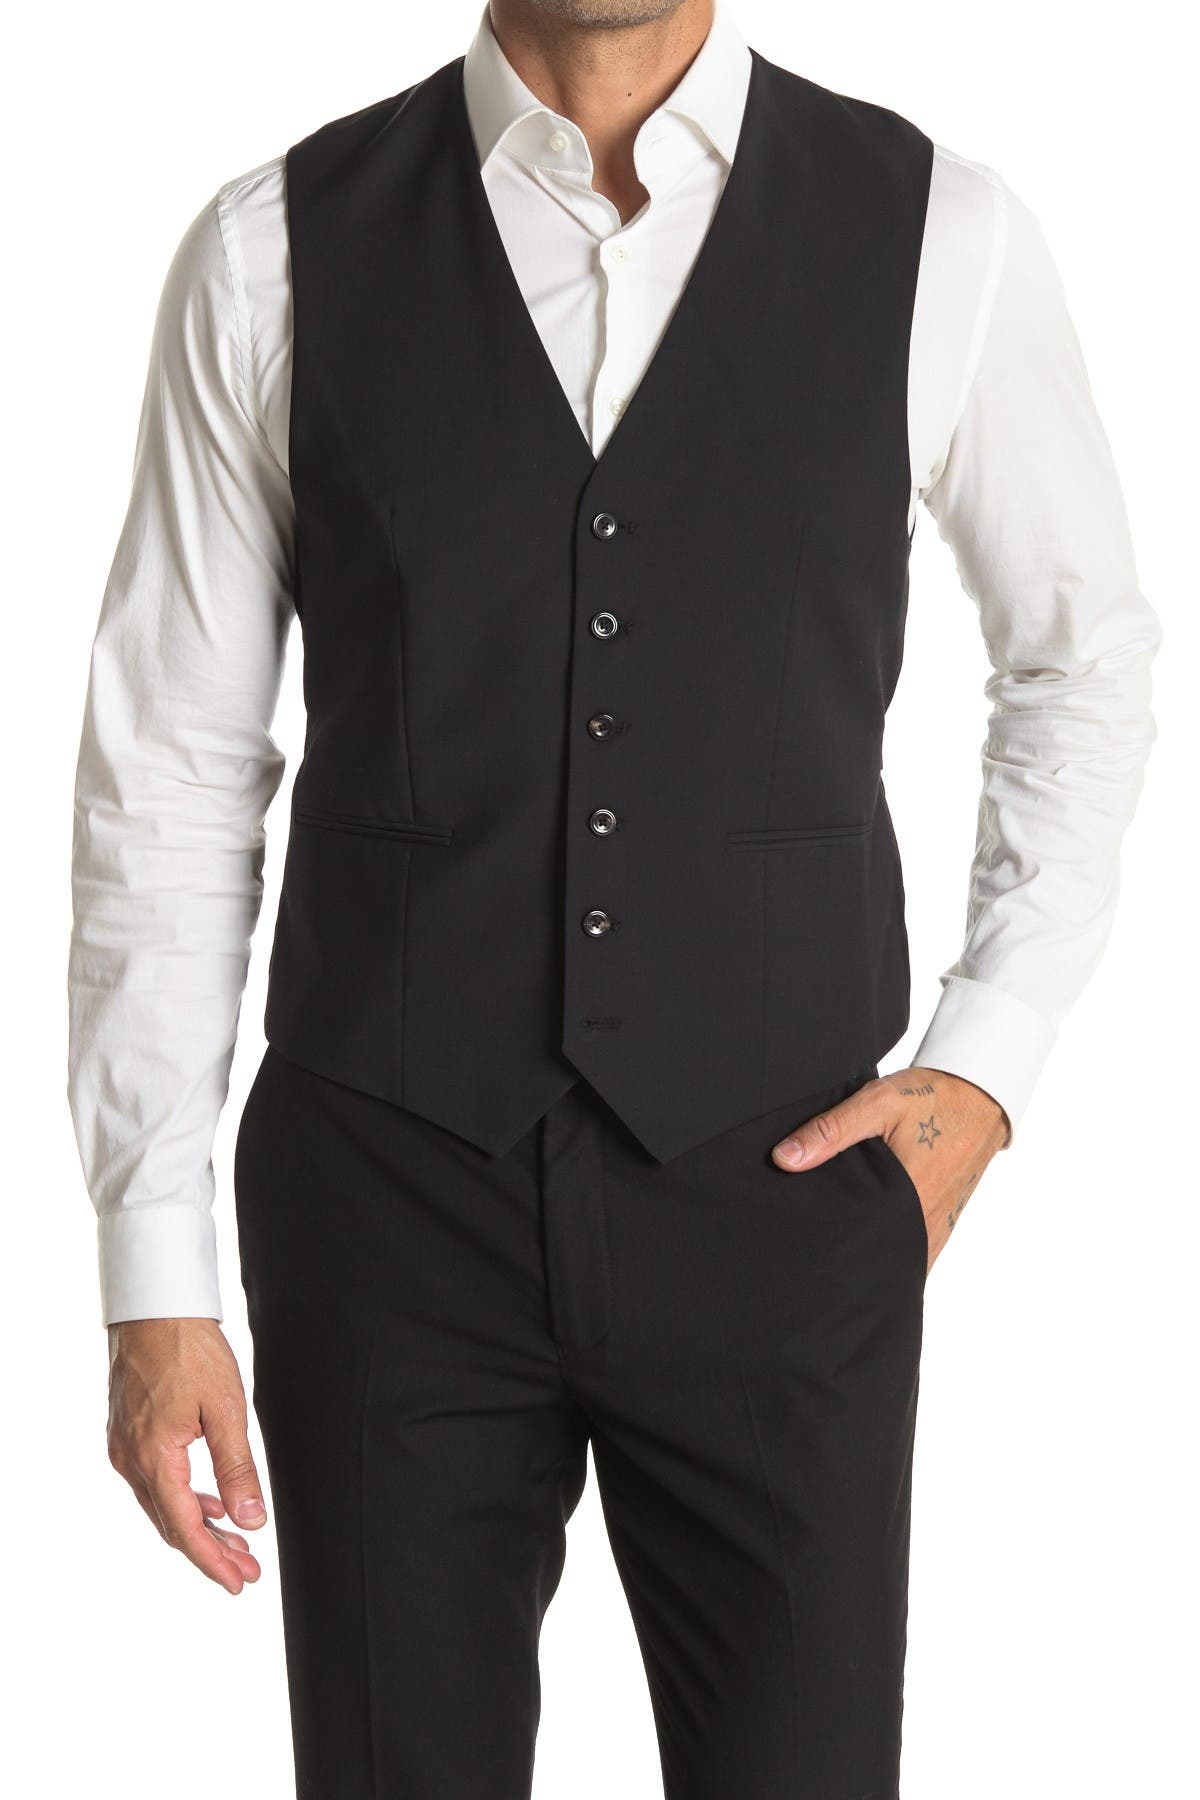 Image of REISS Belief Modern Fit Vest Suit Separates